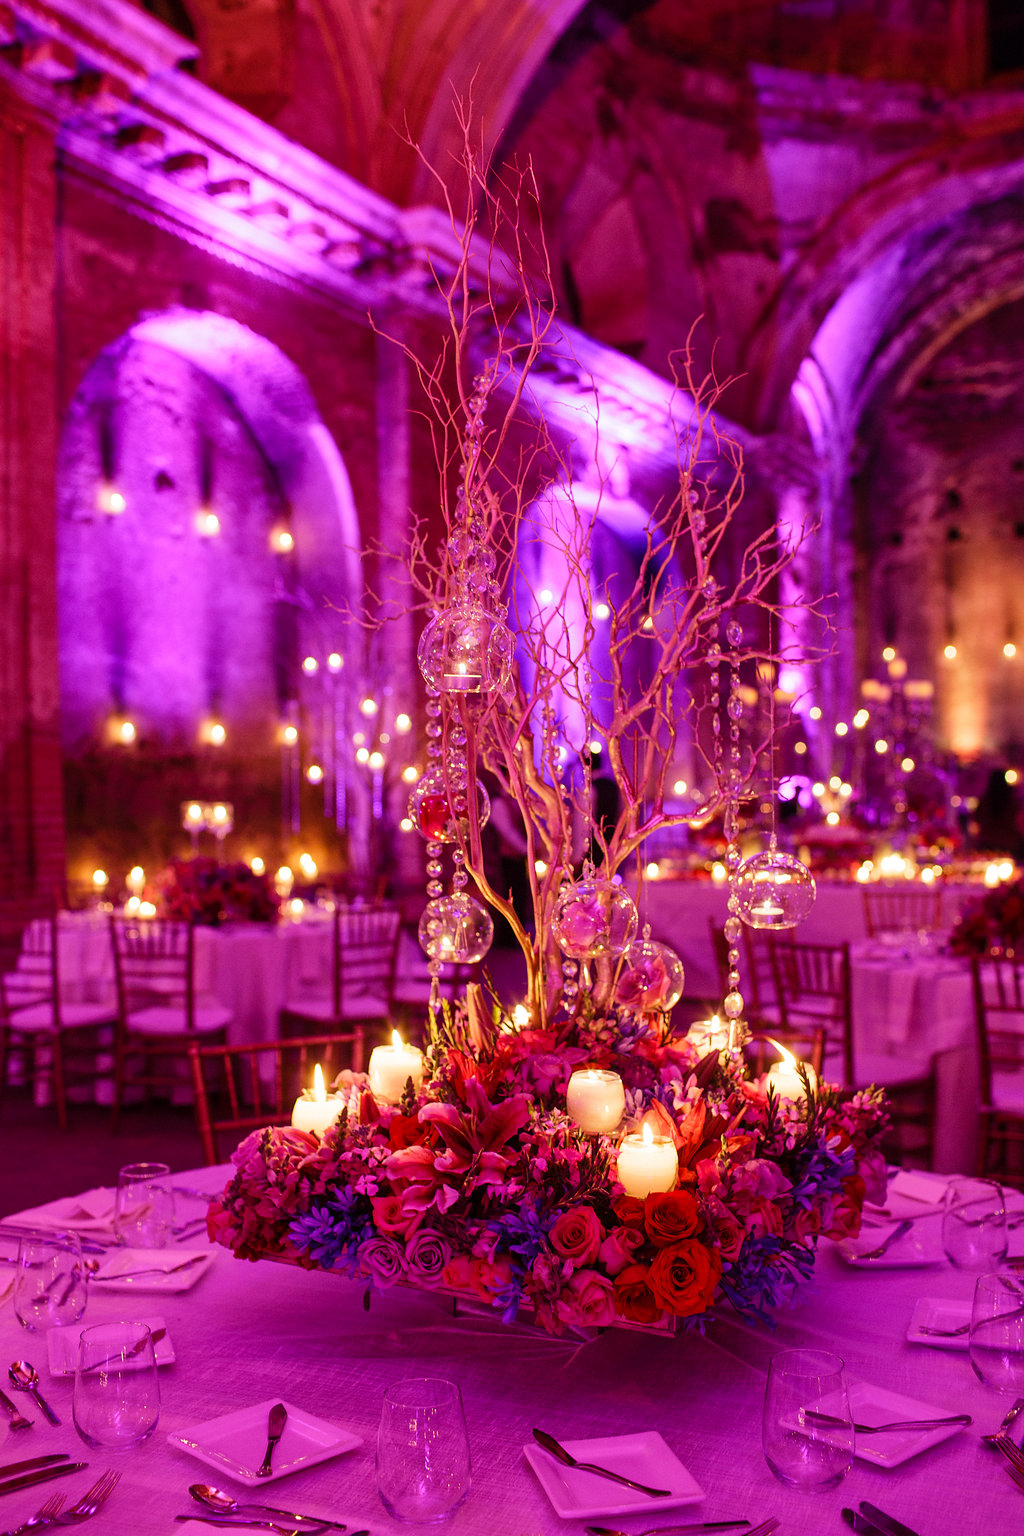 guatemala-destination-wedding-photographer-49.jpg